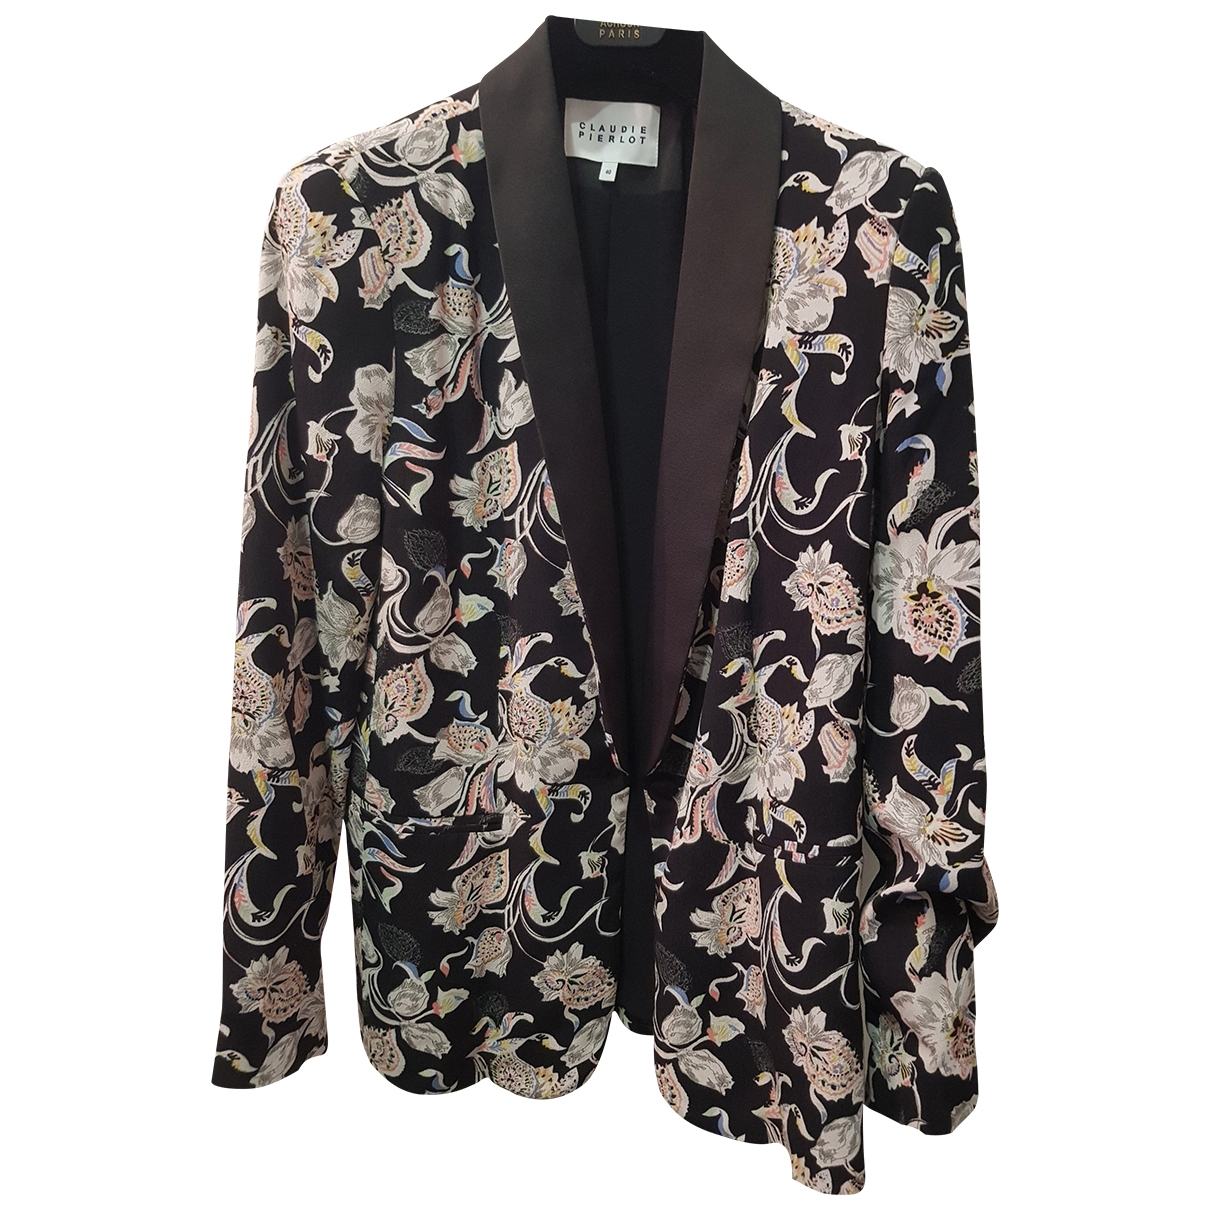 Claudie Pierlot Spring Summer 2019 Black jacket for Women 40 FR